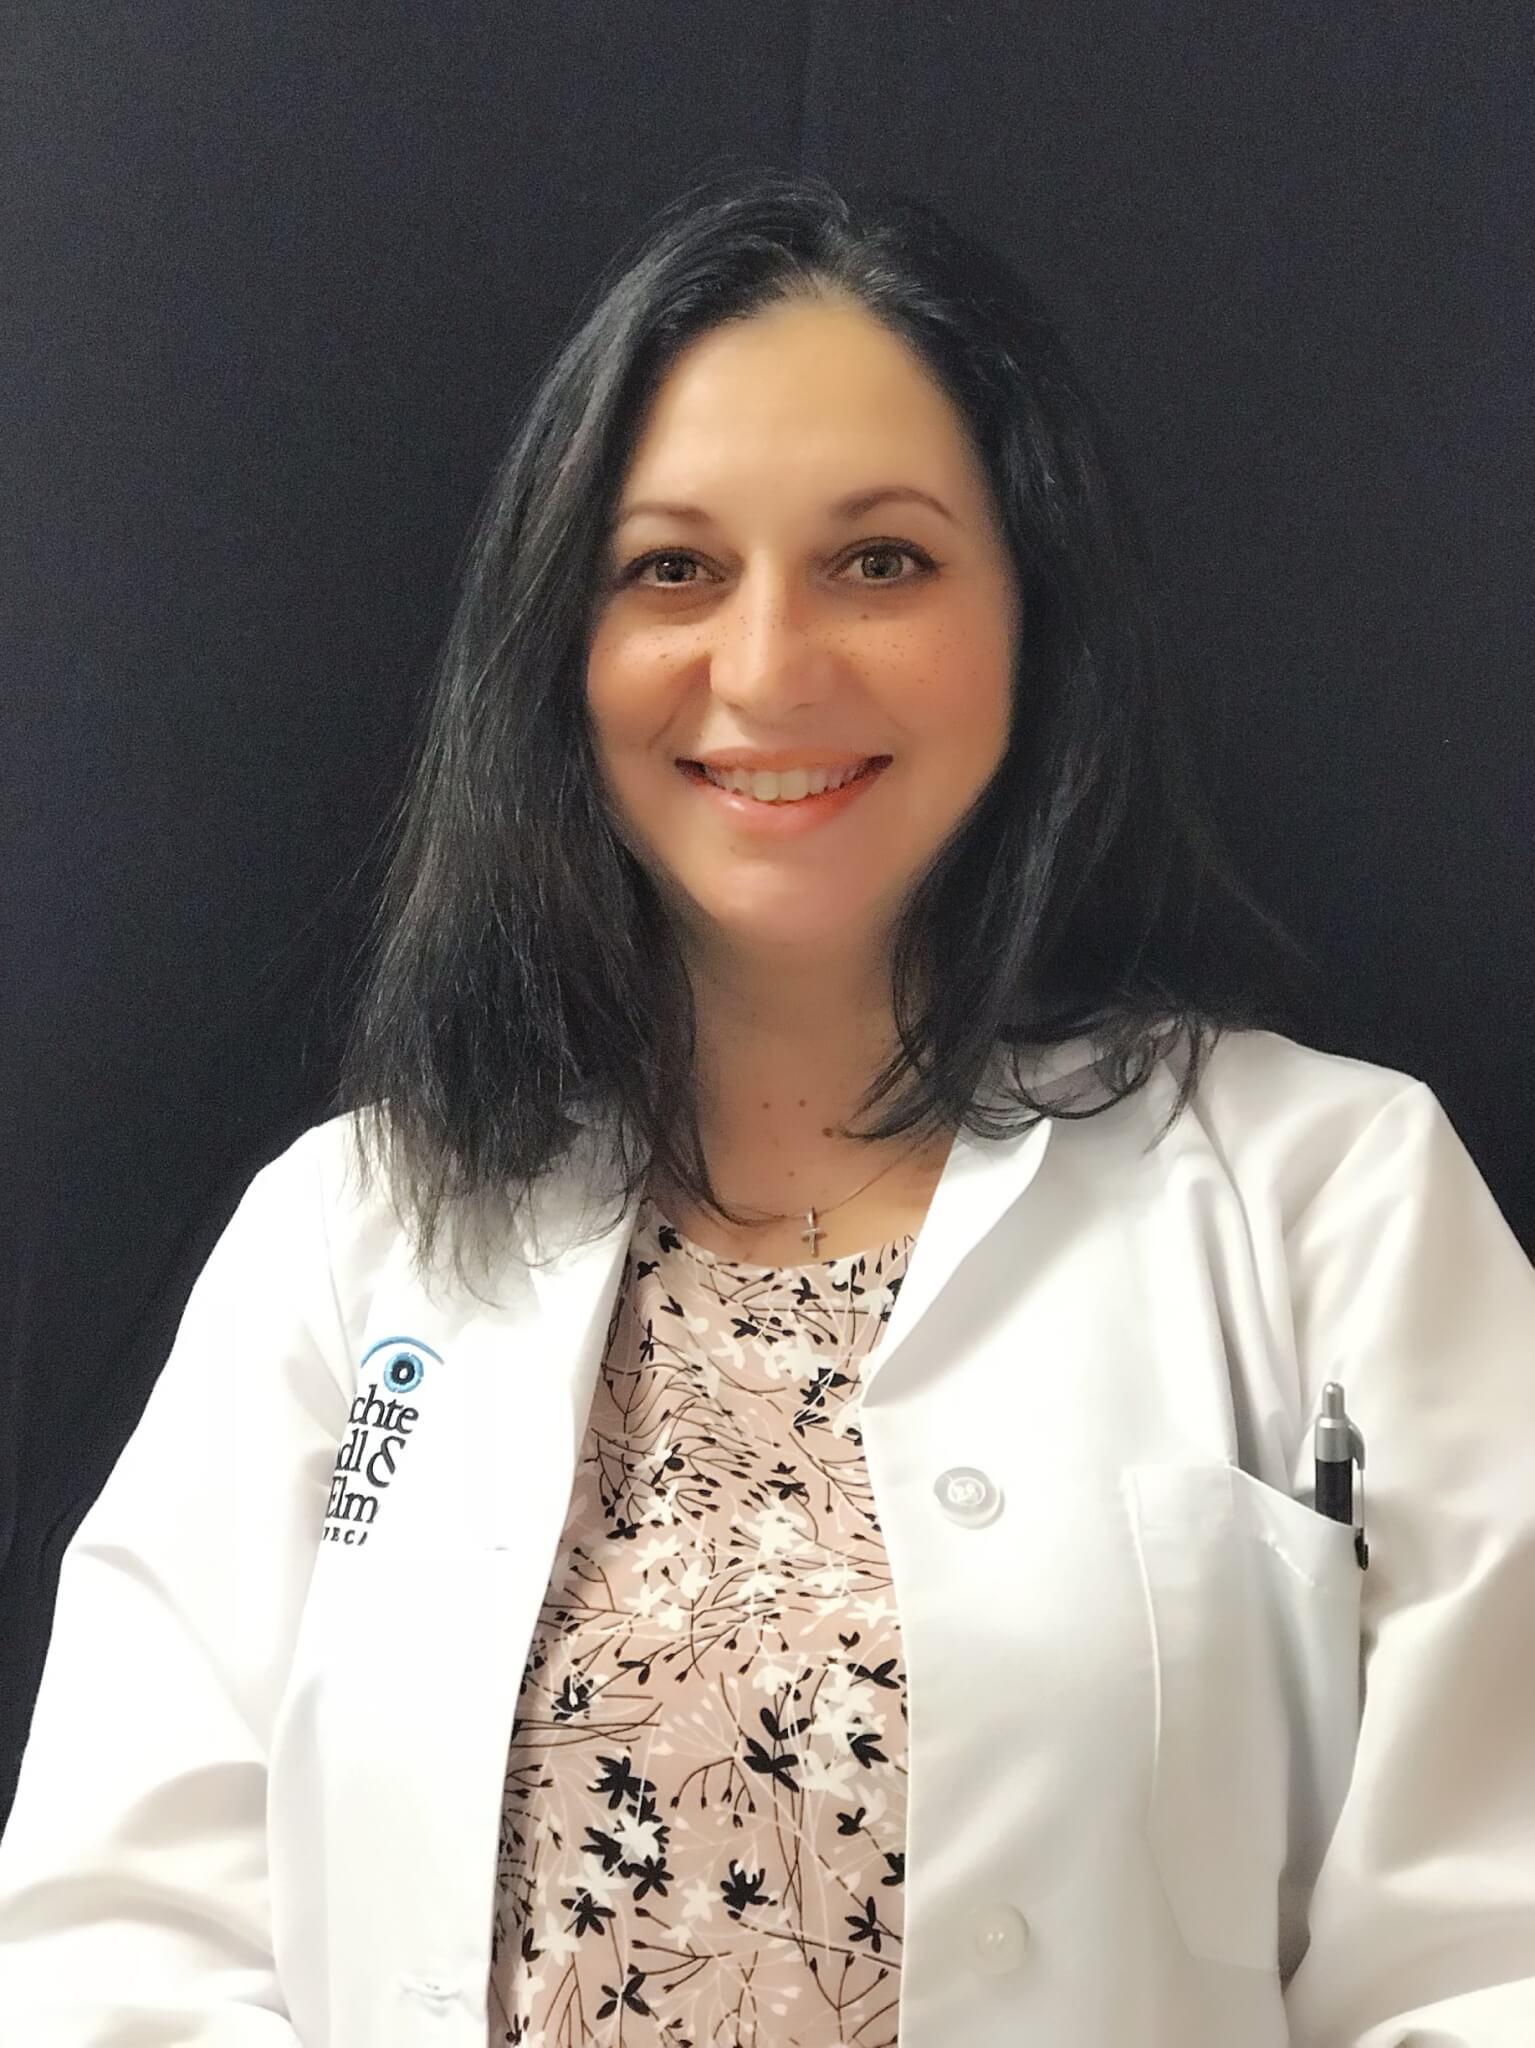 Dr. Matuszak